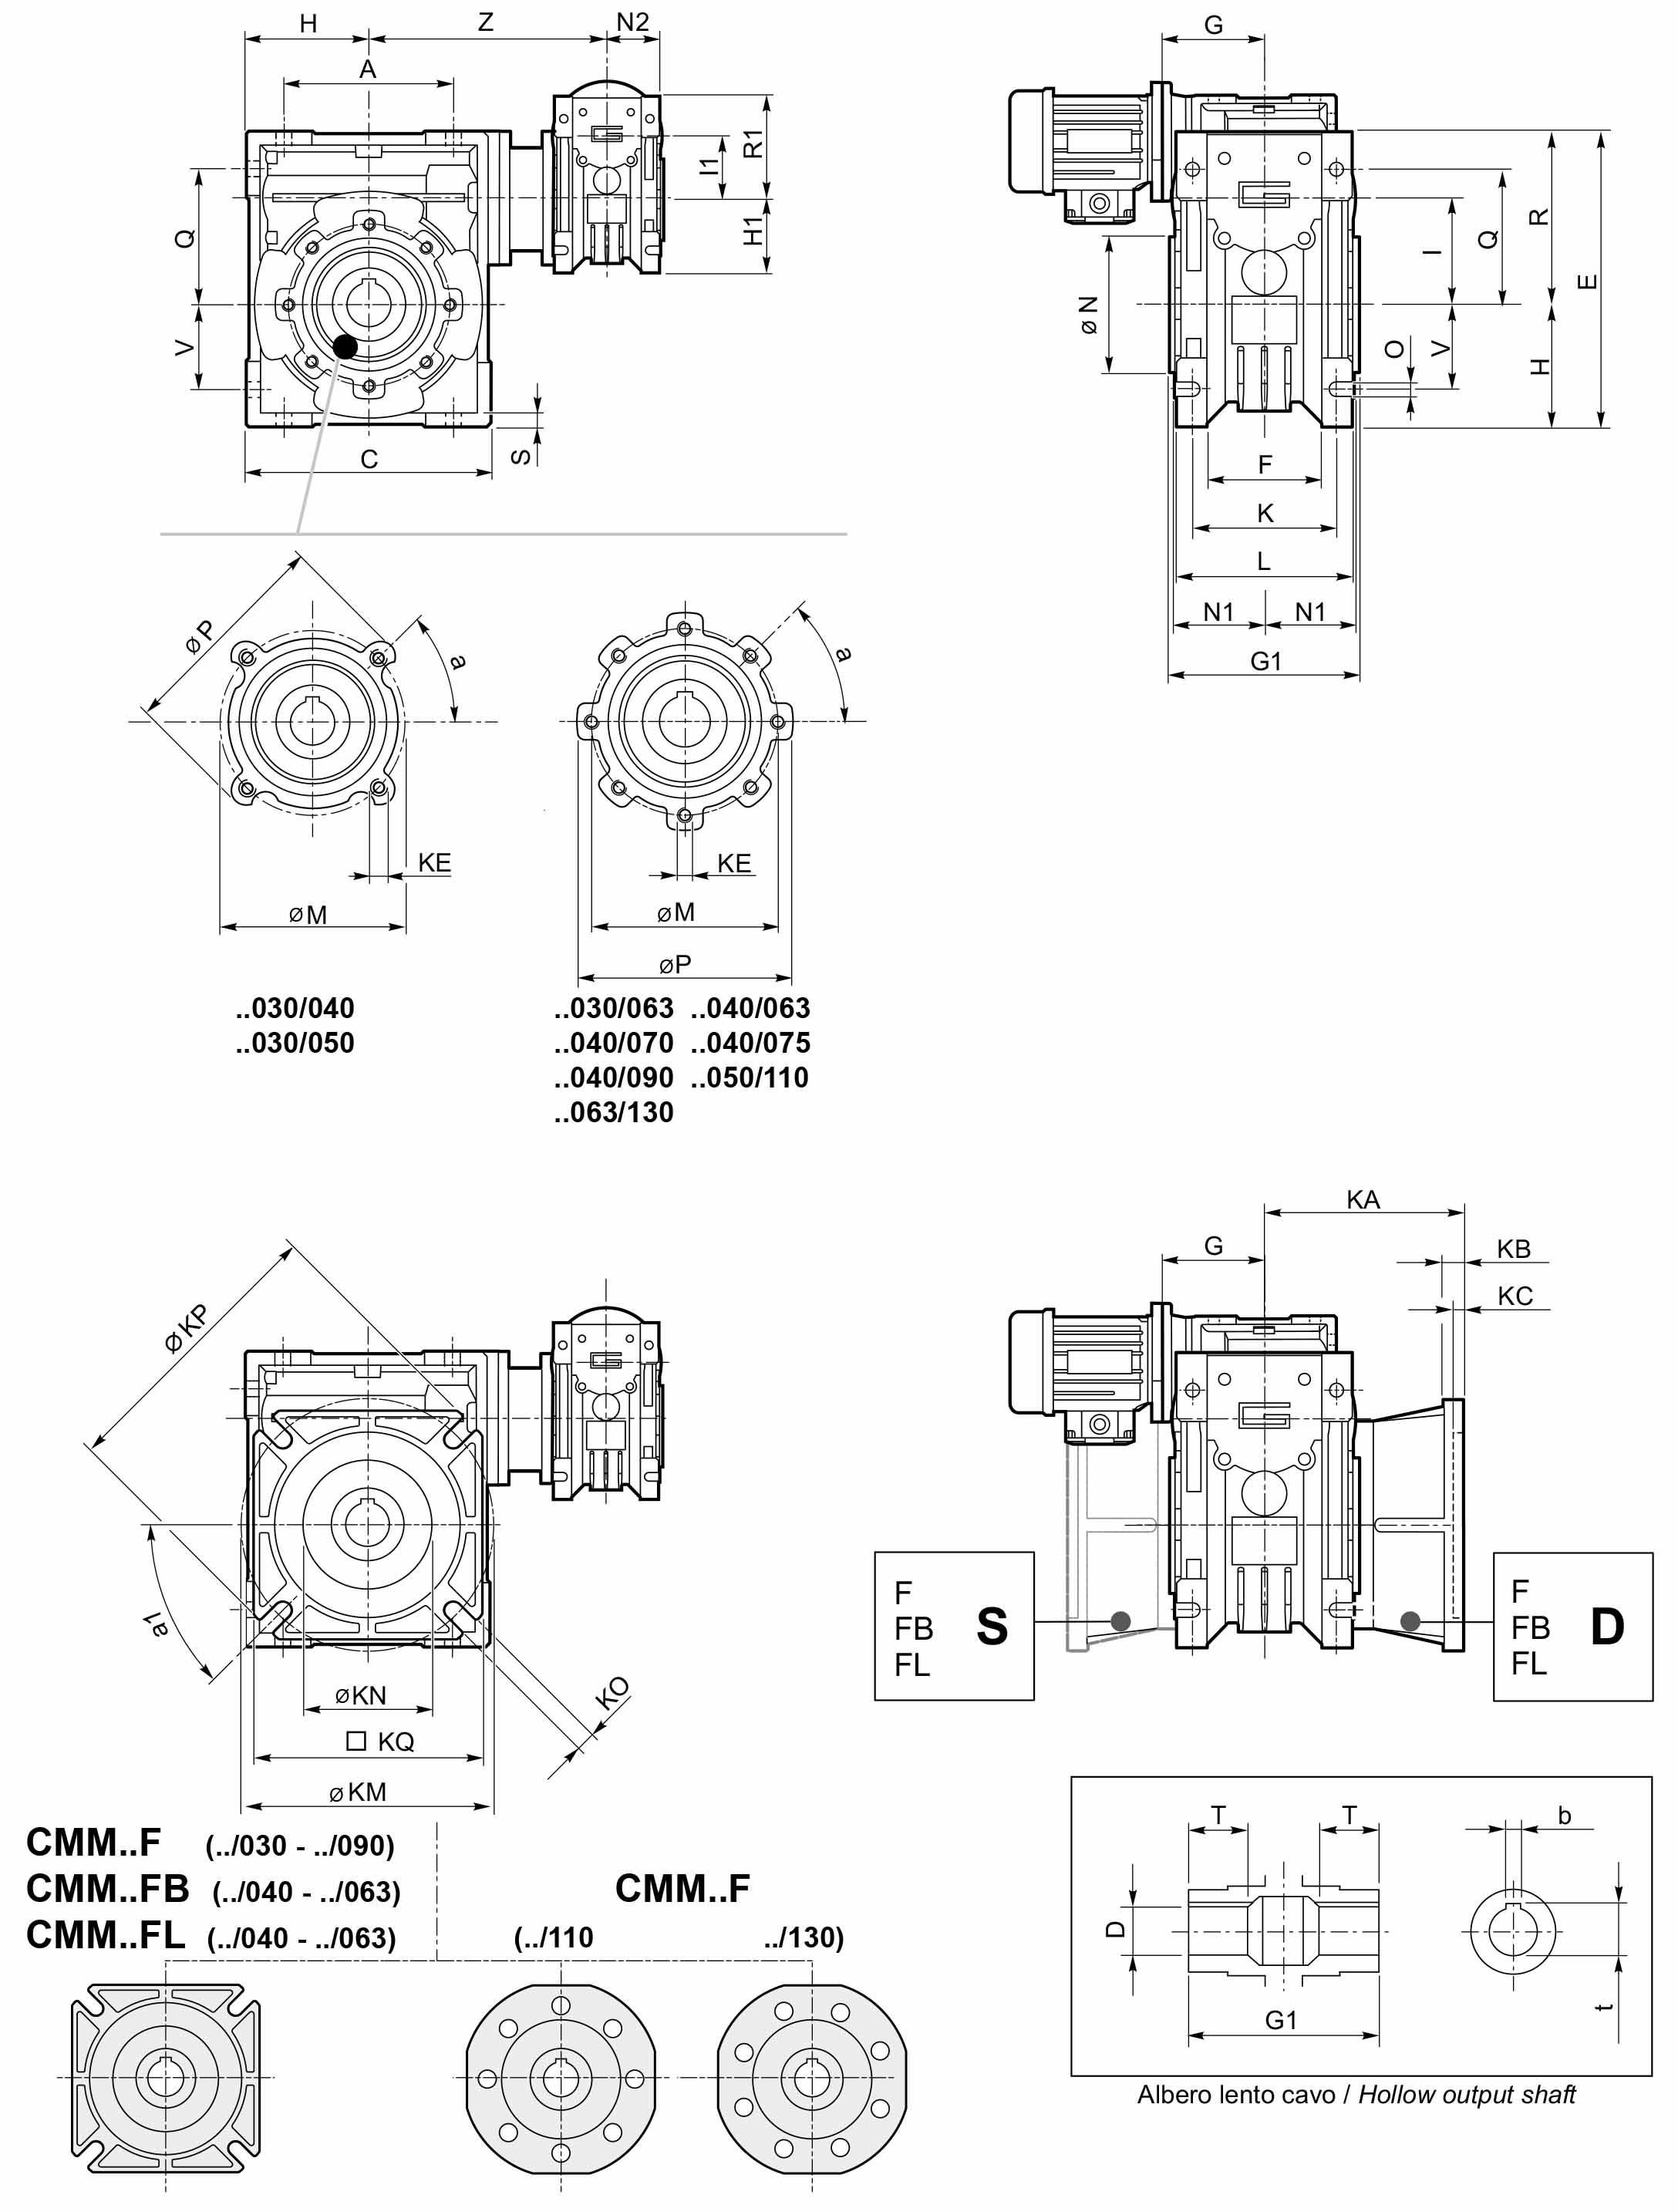 Размеры мотор-редуктора CMM 040/070